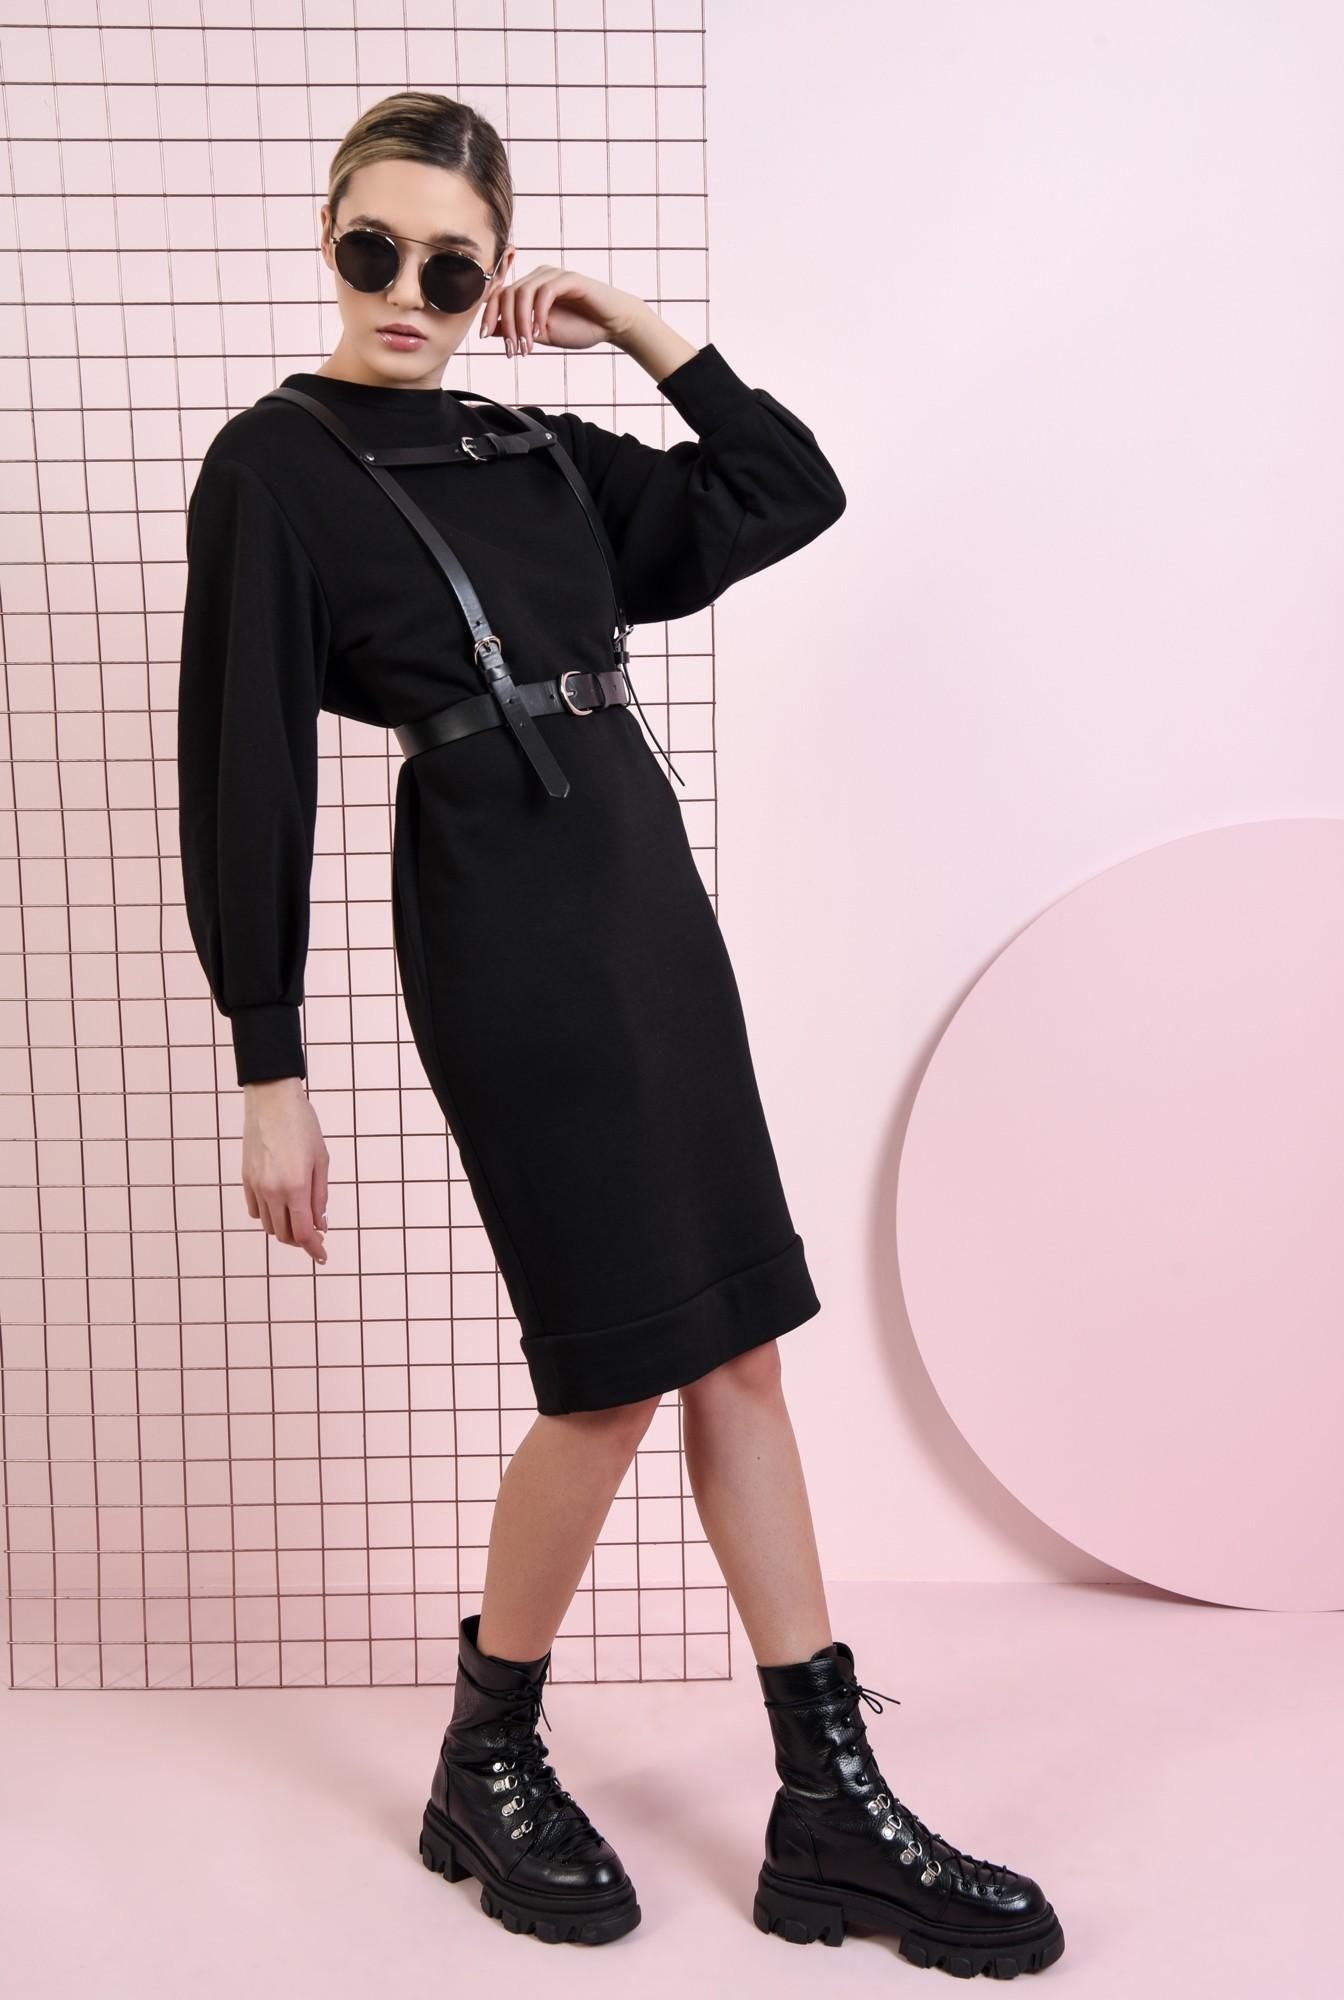 0 - rochie casual, neagra, cu maneca bufanta